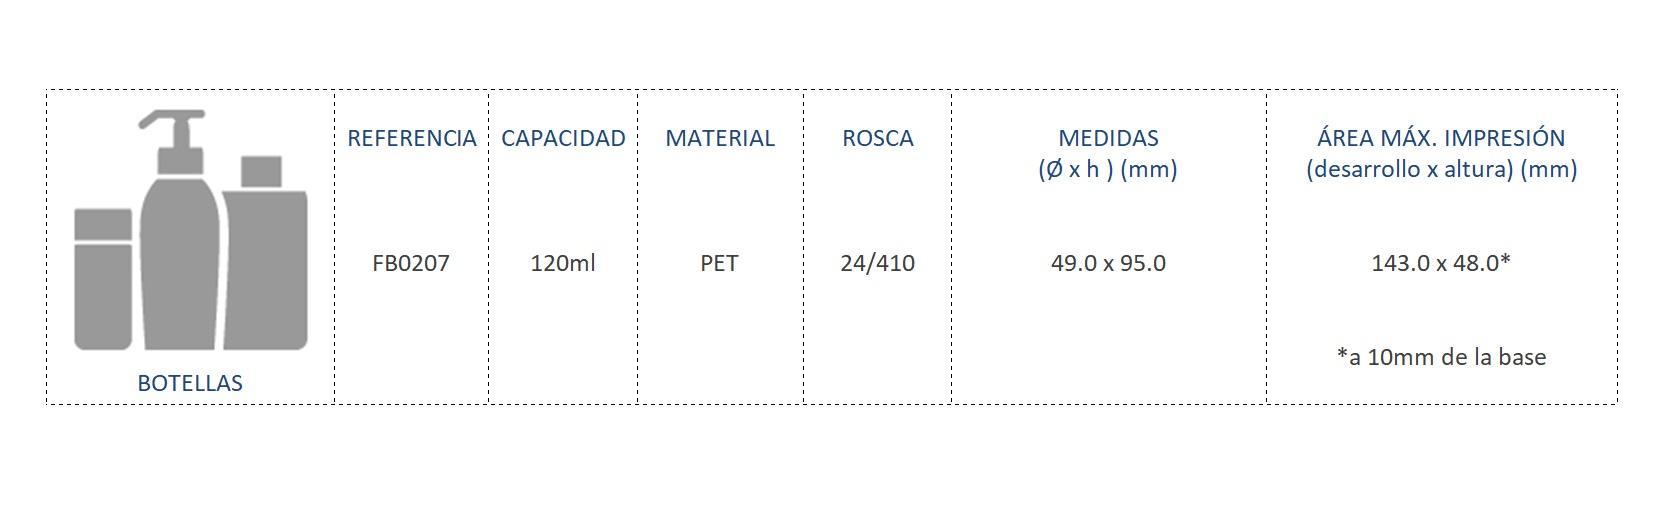 Cuadro de materiales FB0207